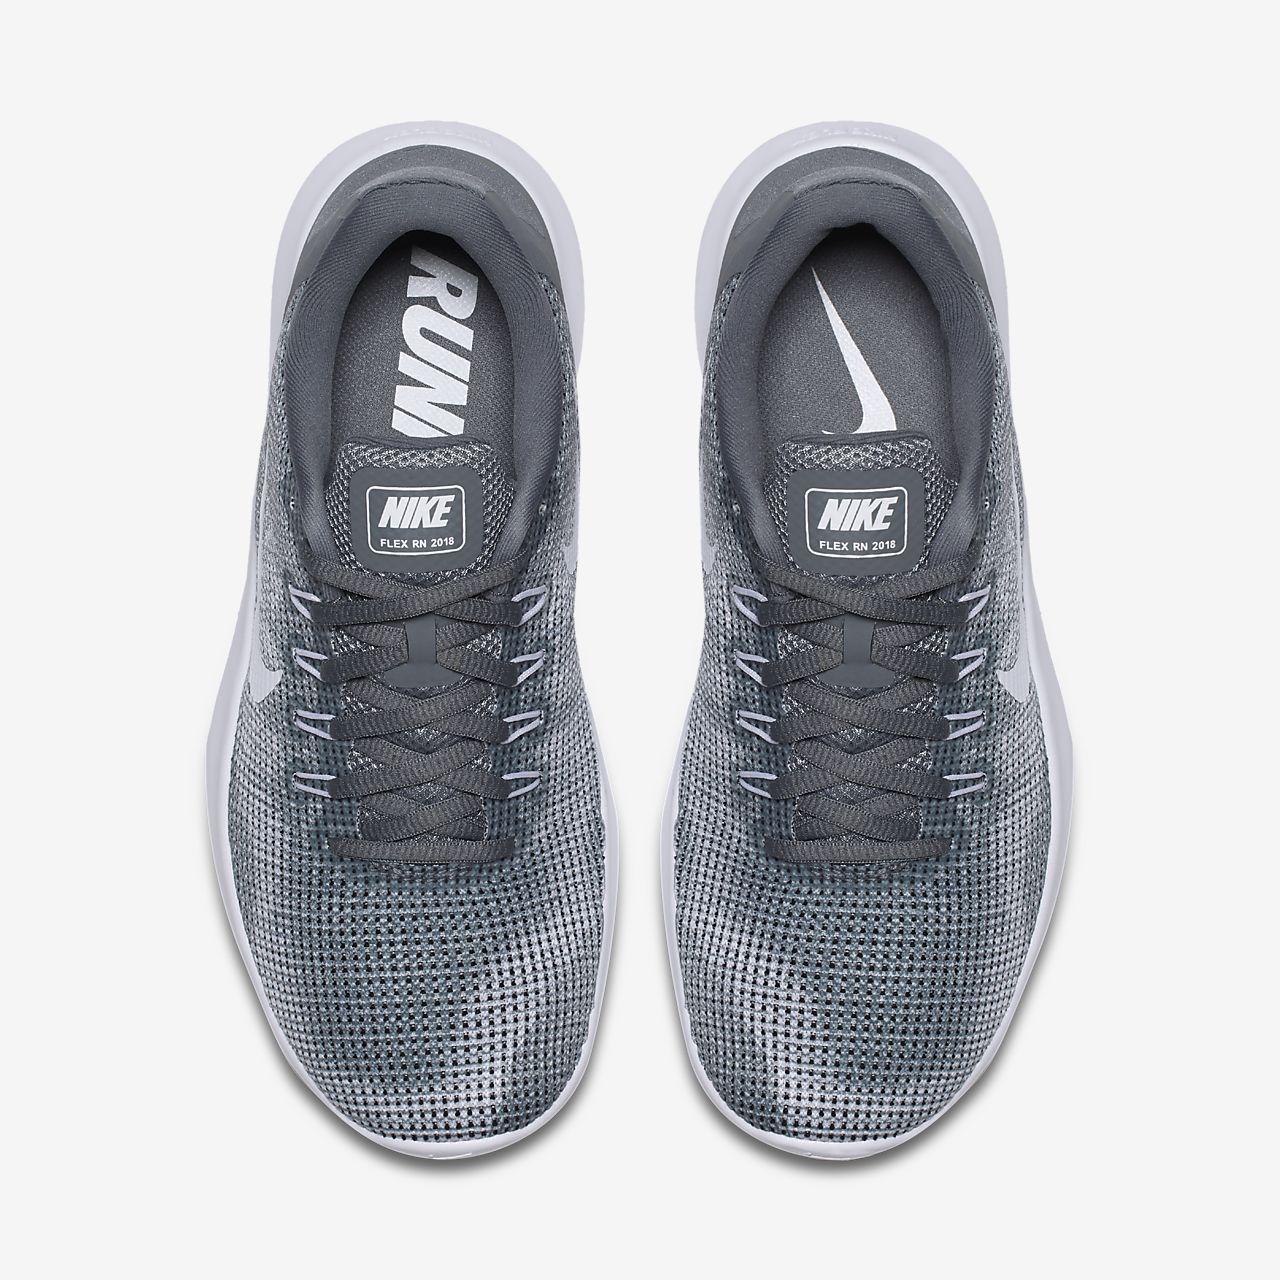 Günstig Nike Performance Grau Flex 2016 Run Laufschuh